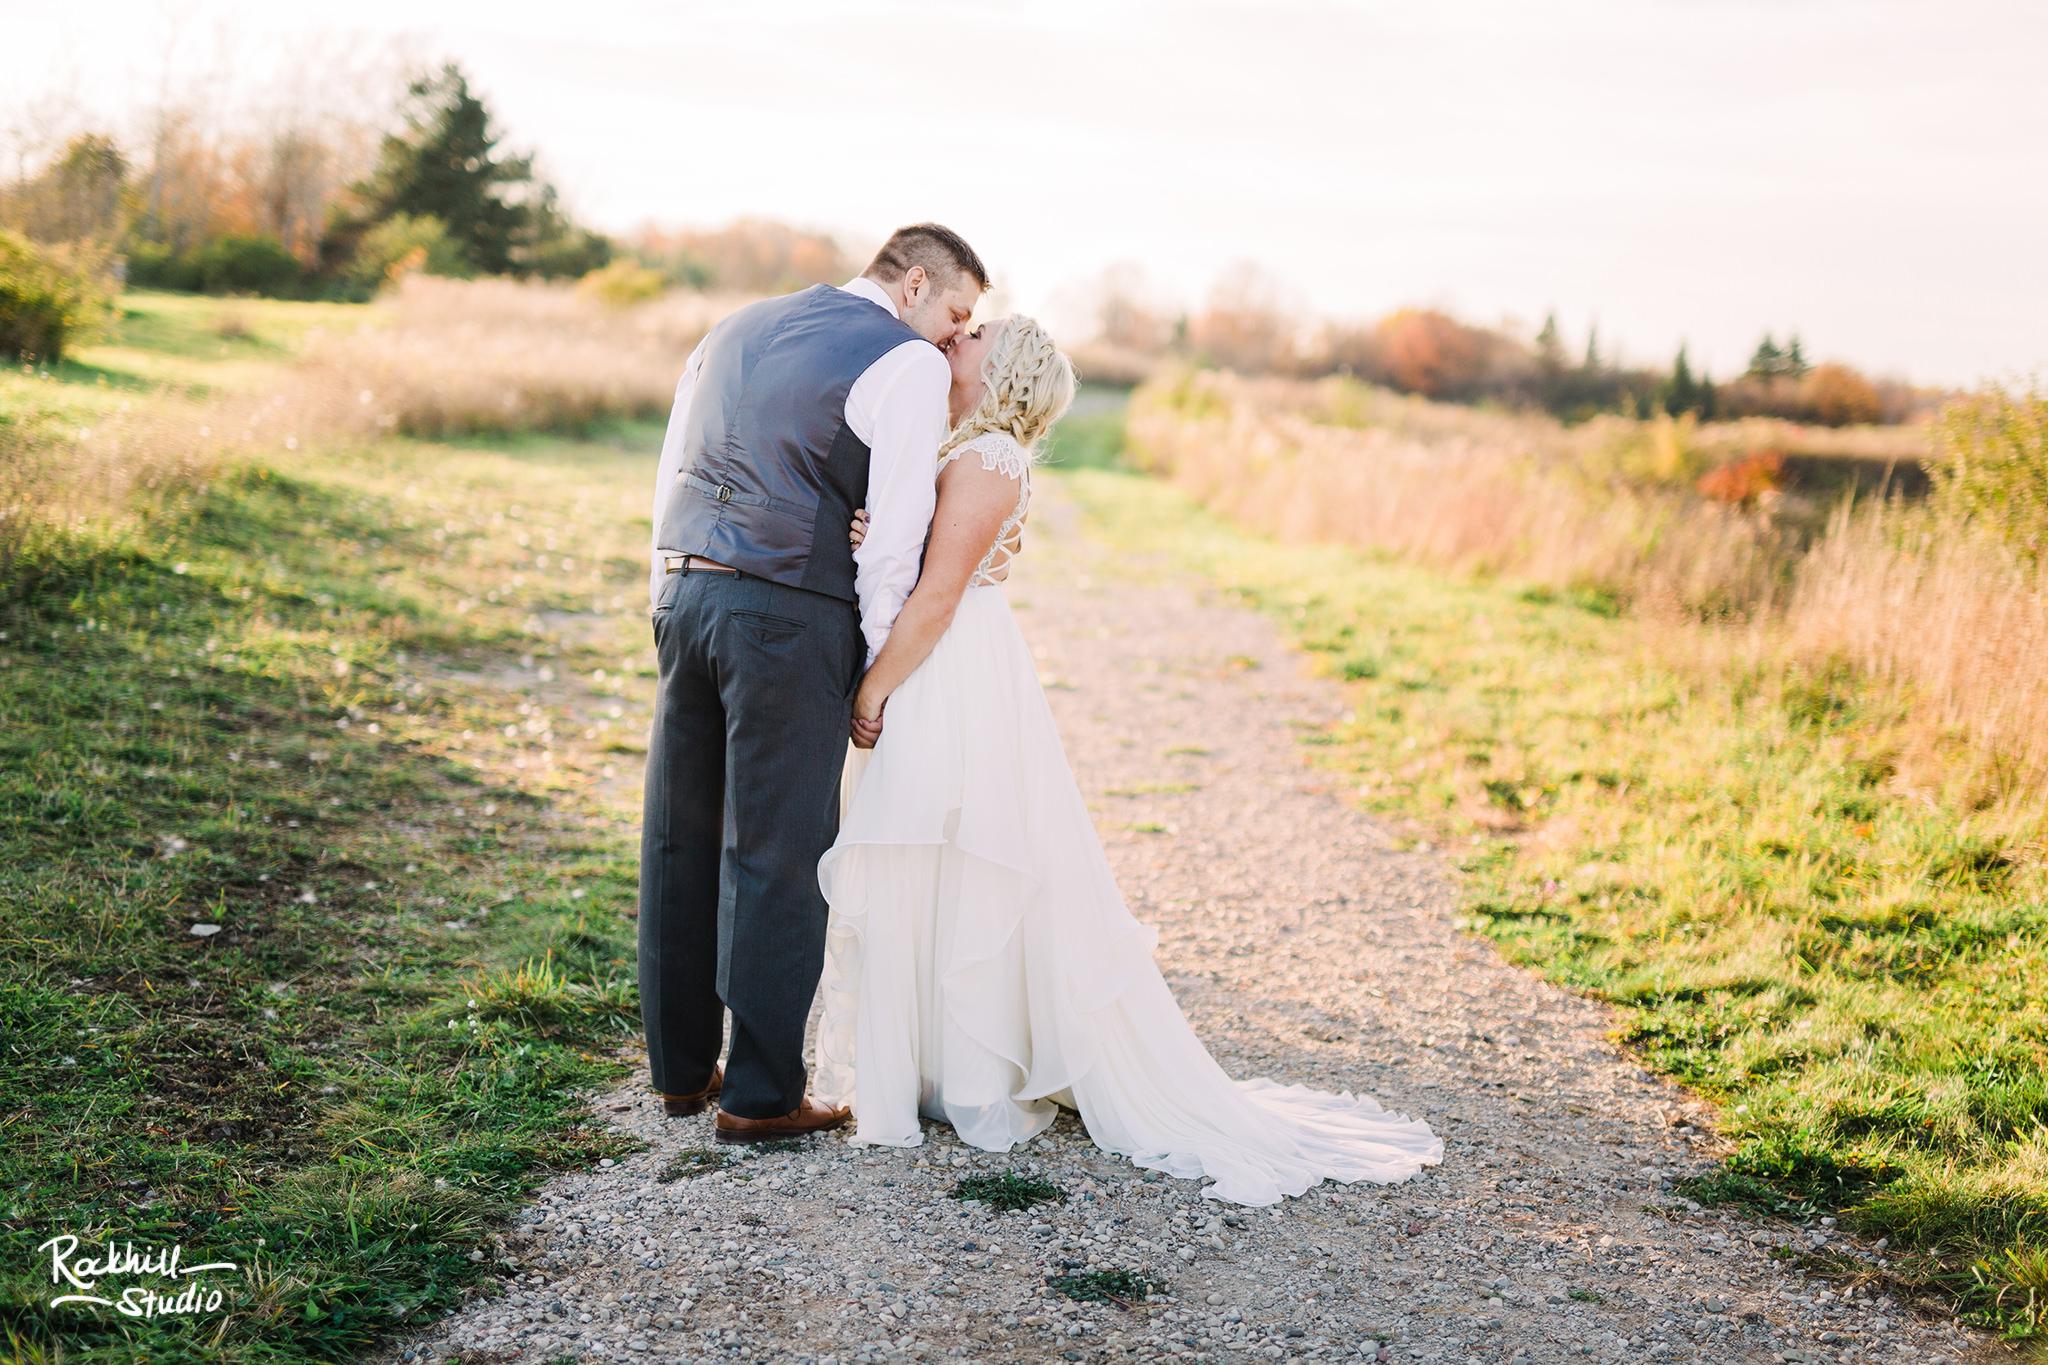 Traverse_city_wedding_photographer_michigan_rockhill_studio_bride_groom_QD_52.jpg